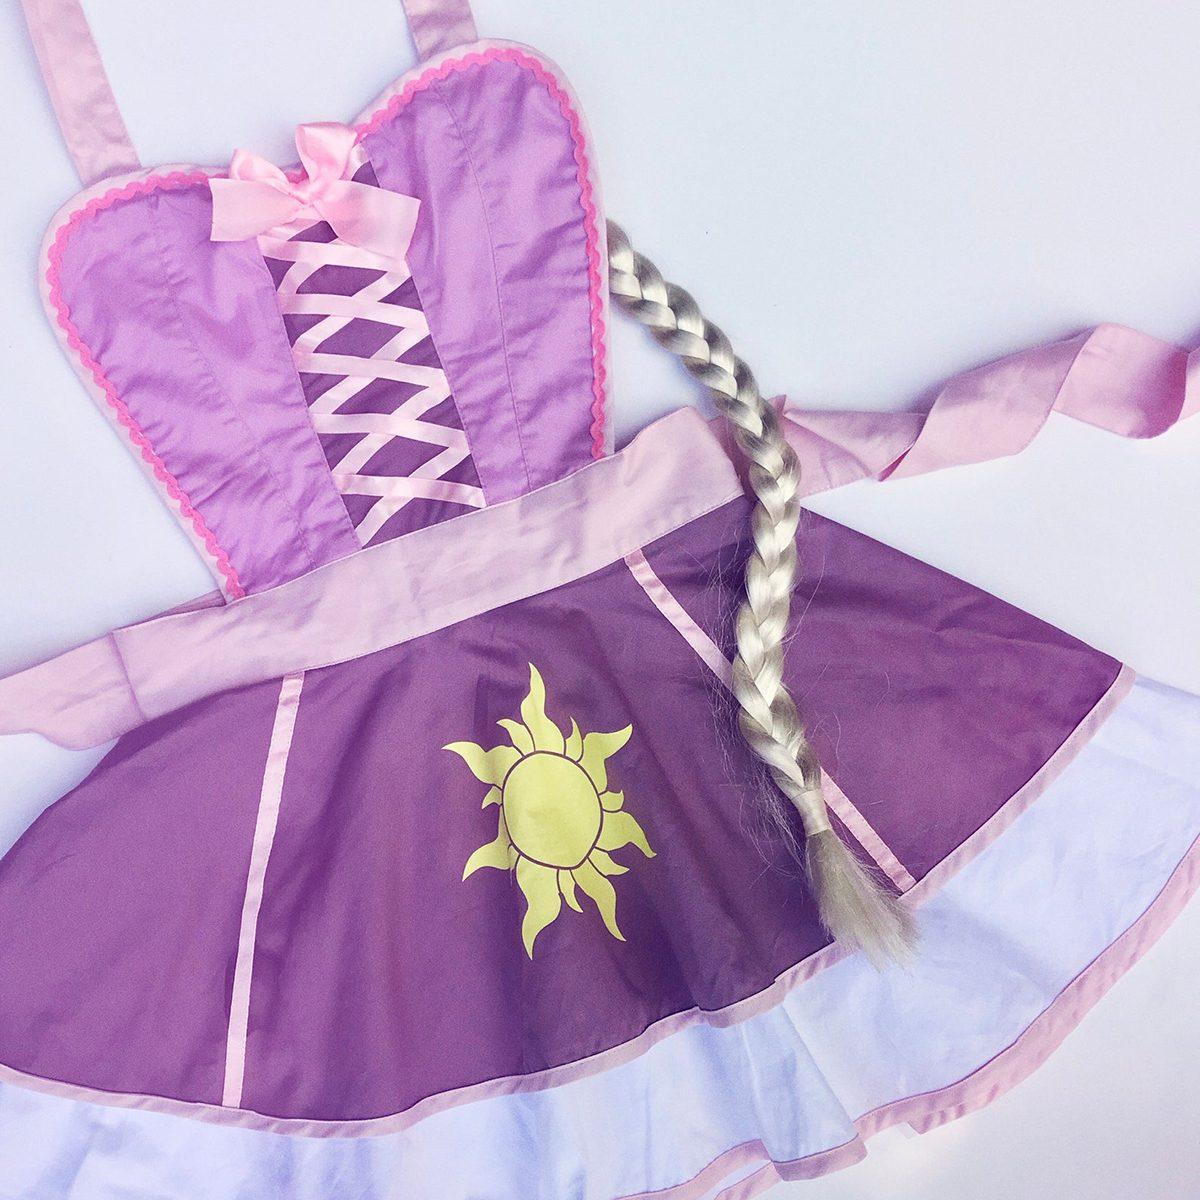 Princess Apron, Rapunzel (inspired)